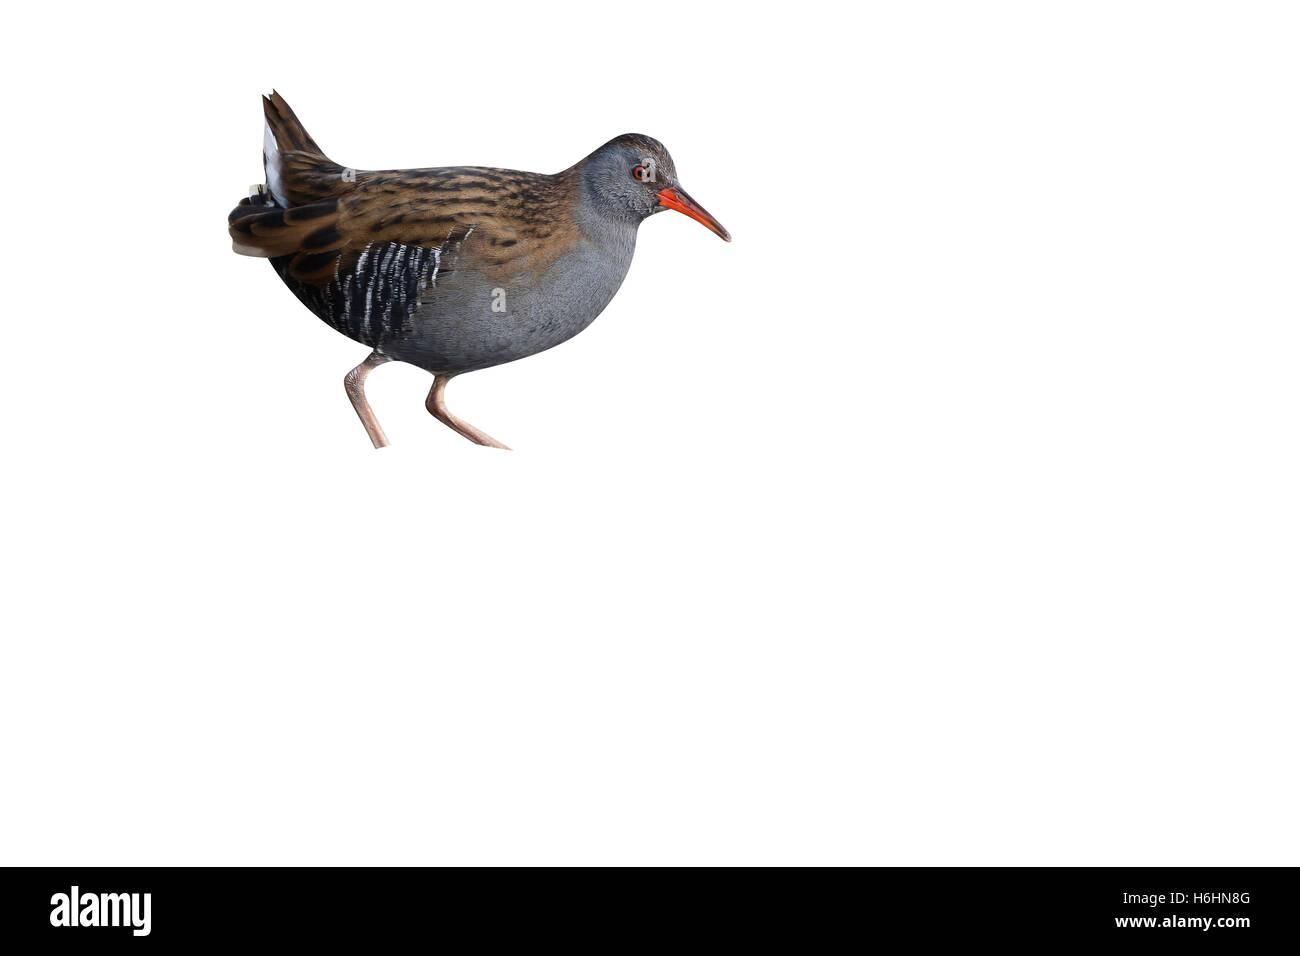 Water rail, Rallus aquaticus, single bird in marsh, Warwickshire, December 2014 - Stock Image